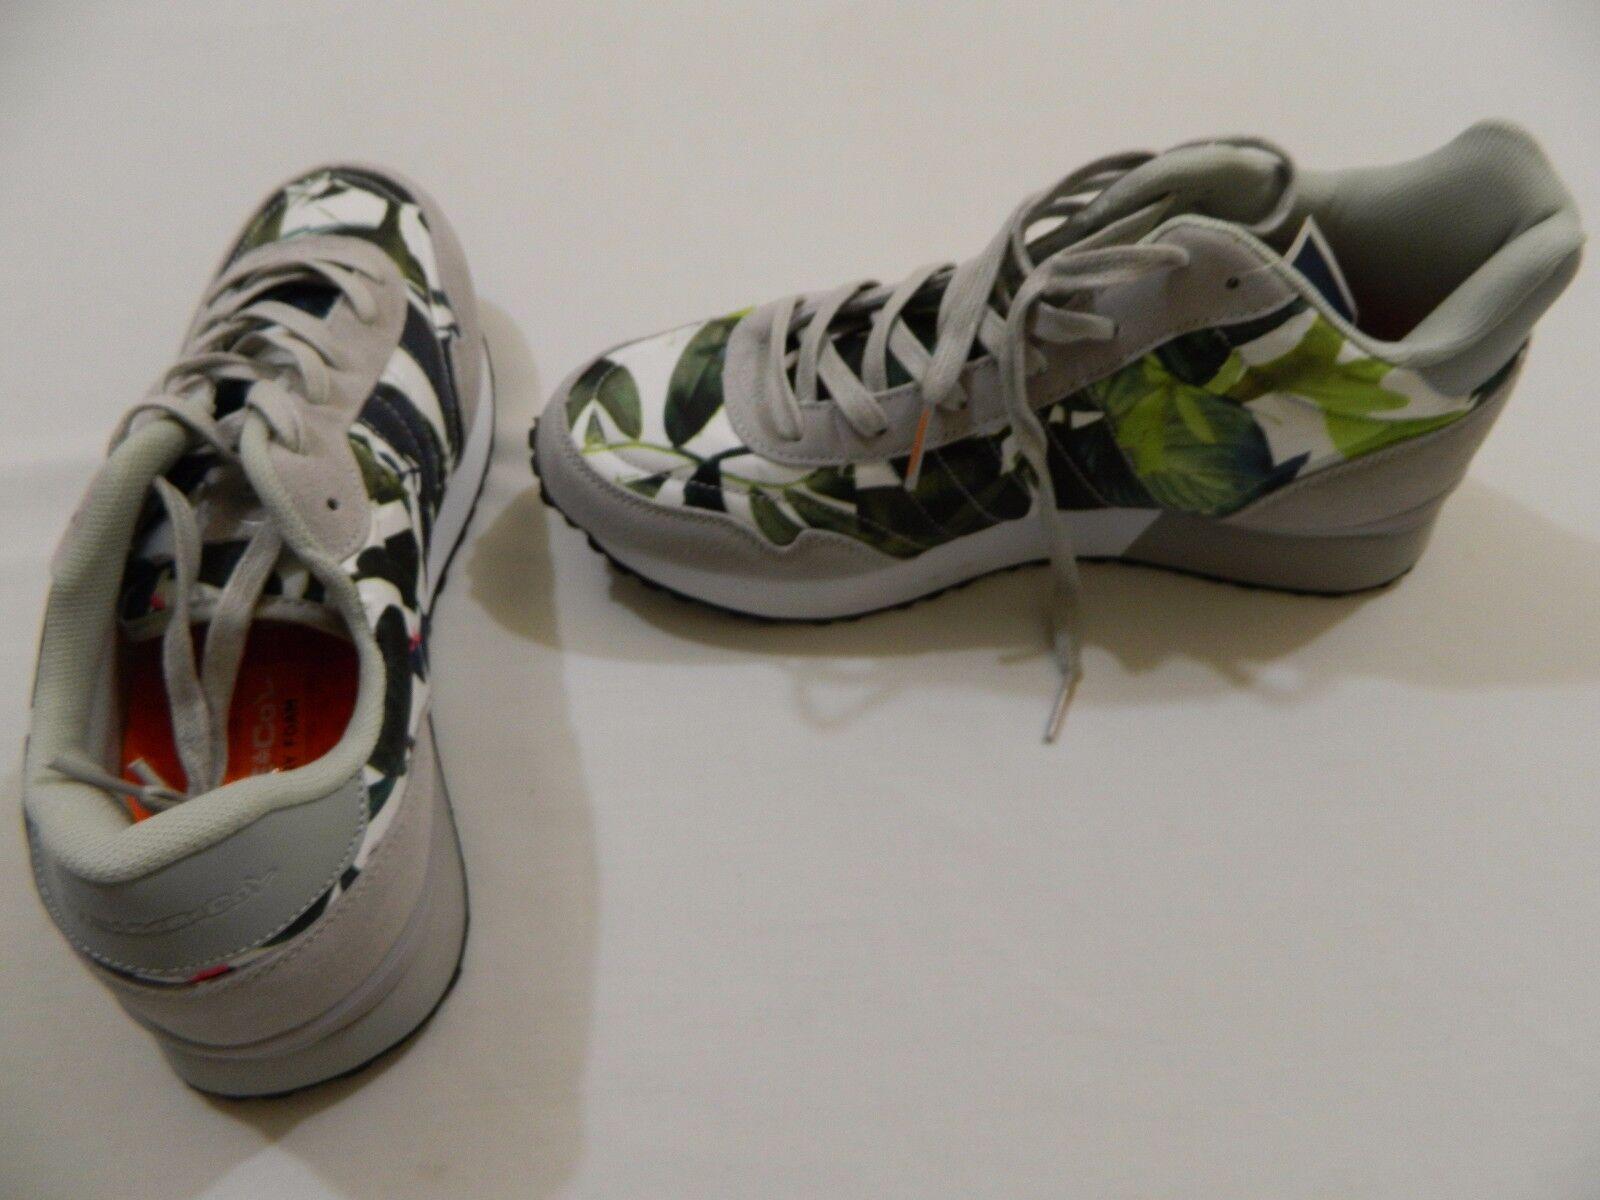 NEW BUCK in BOX PUMA PUMA SMASH BUCK NEW Men's Shoes sneakers 356753 21 peacoat BLUE US10 c9dfbc